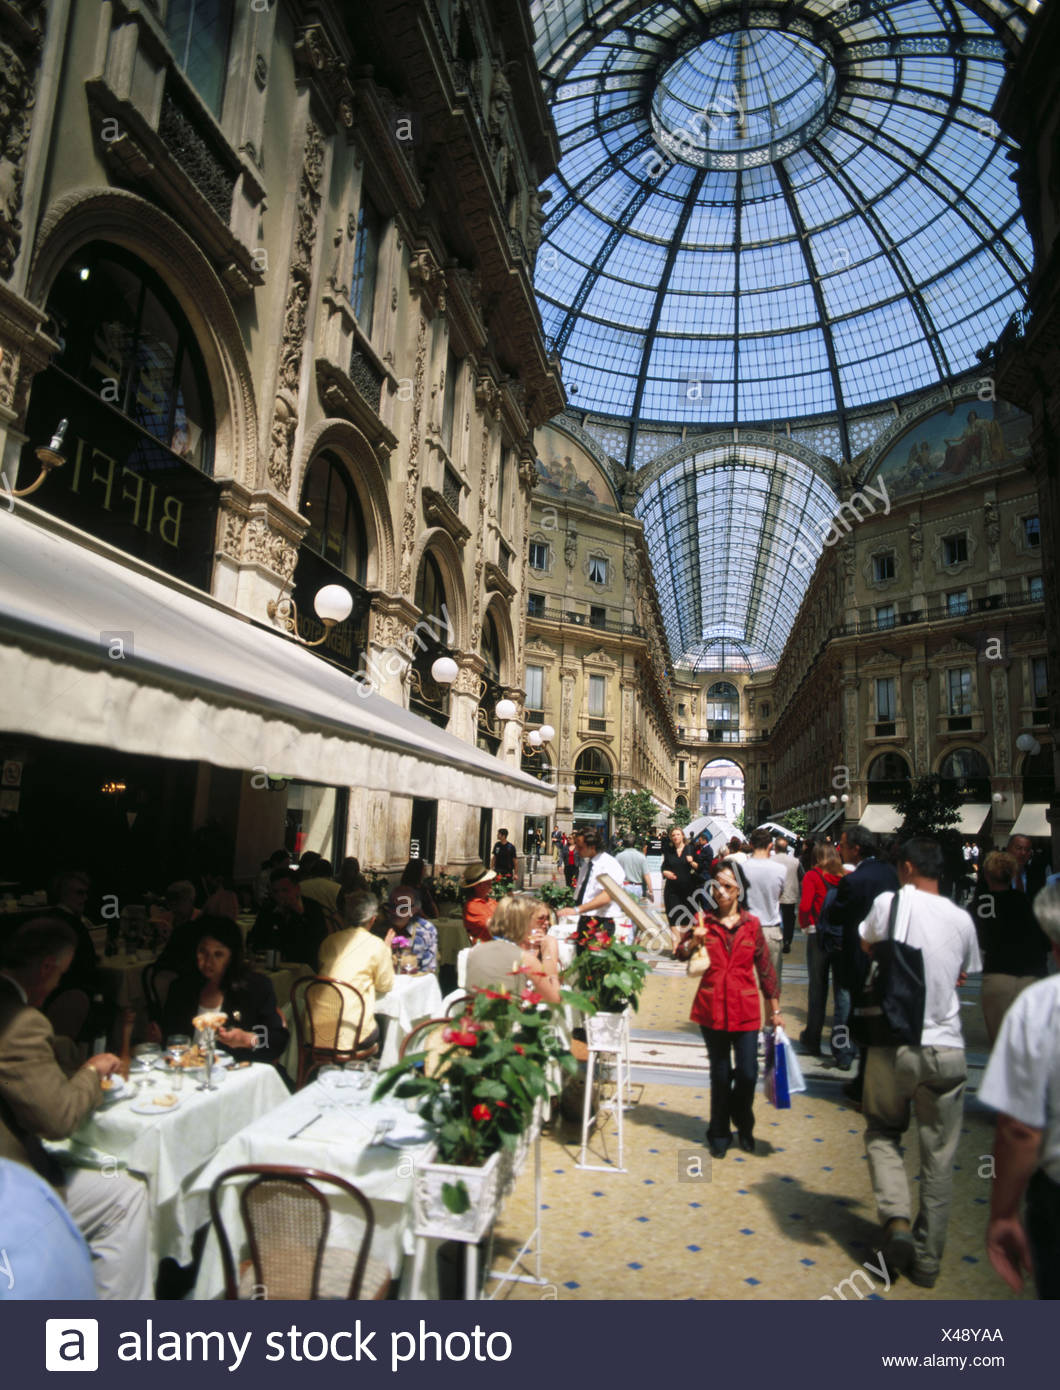 Emanuele Galleria Vittorio Italy Europe people Milan no model release - Stock Image